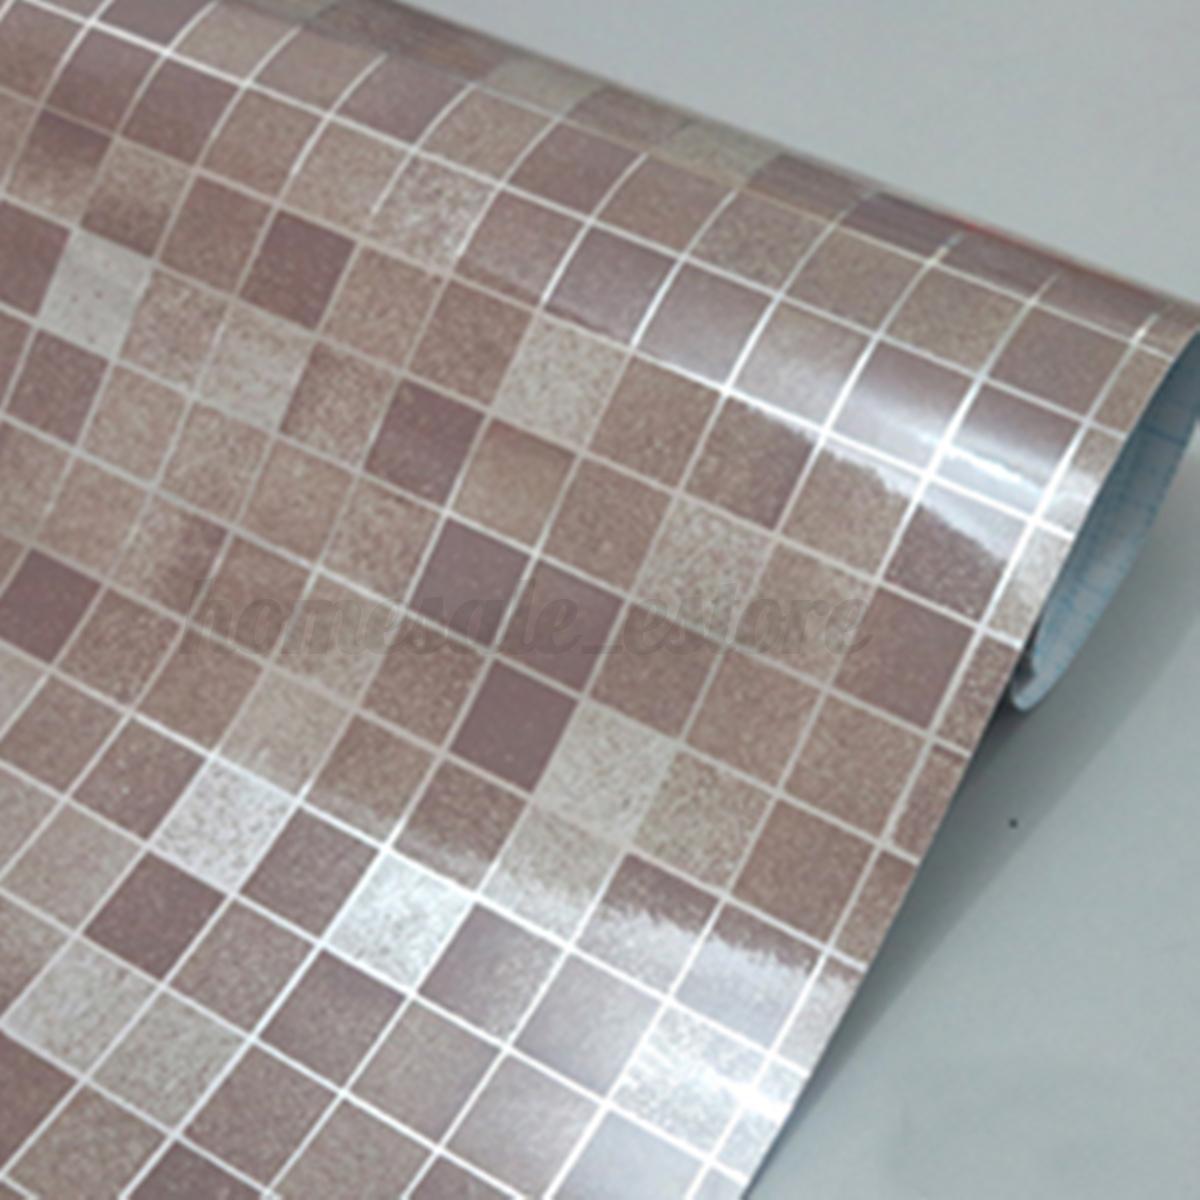 98 39 mosaic aluminum foil wallpaper wall sticker bathroom for Mosaic wallpaper for walls